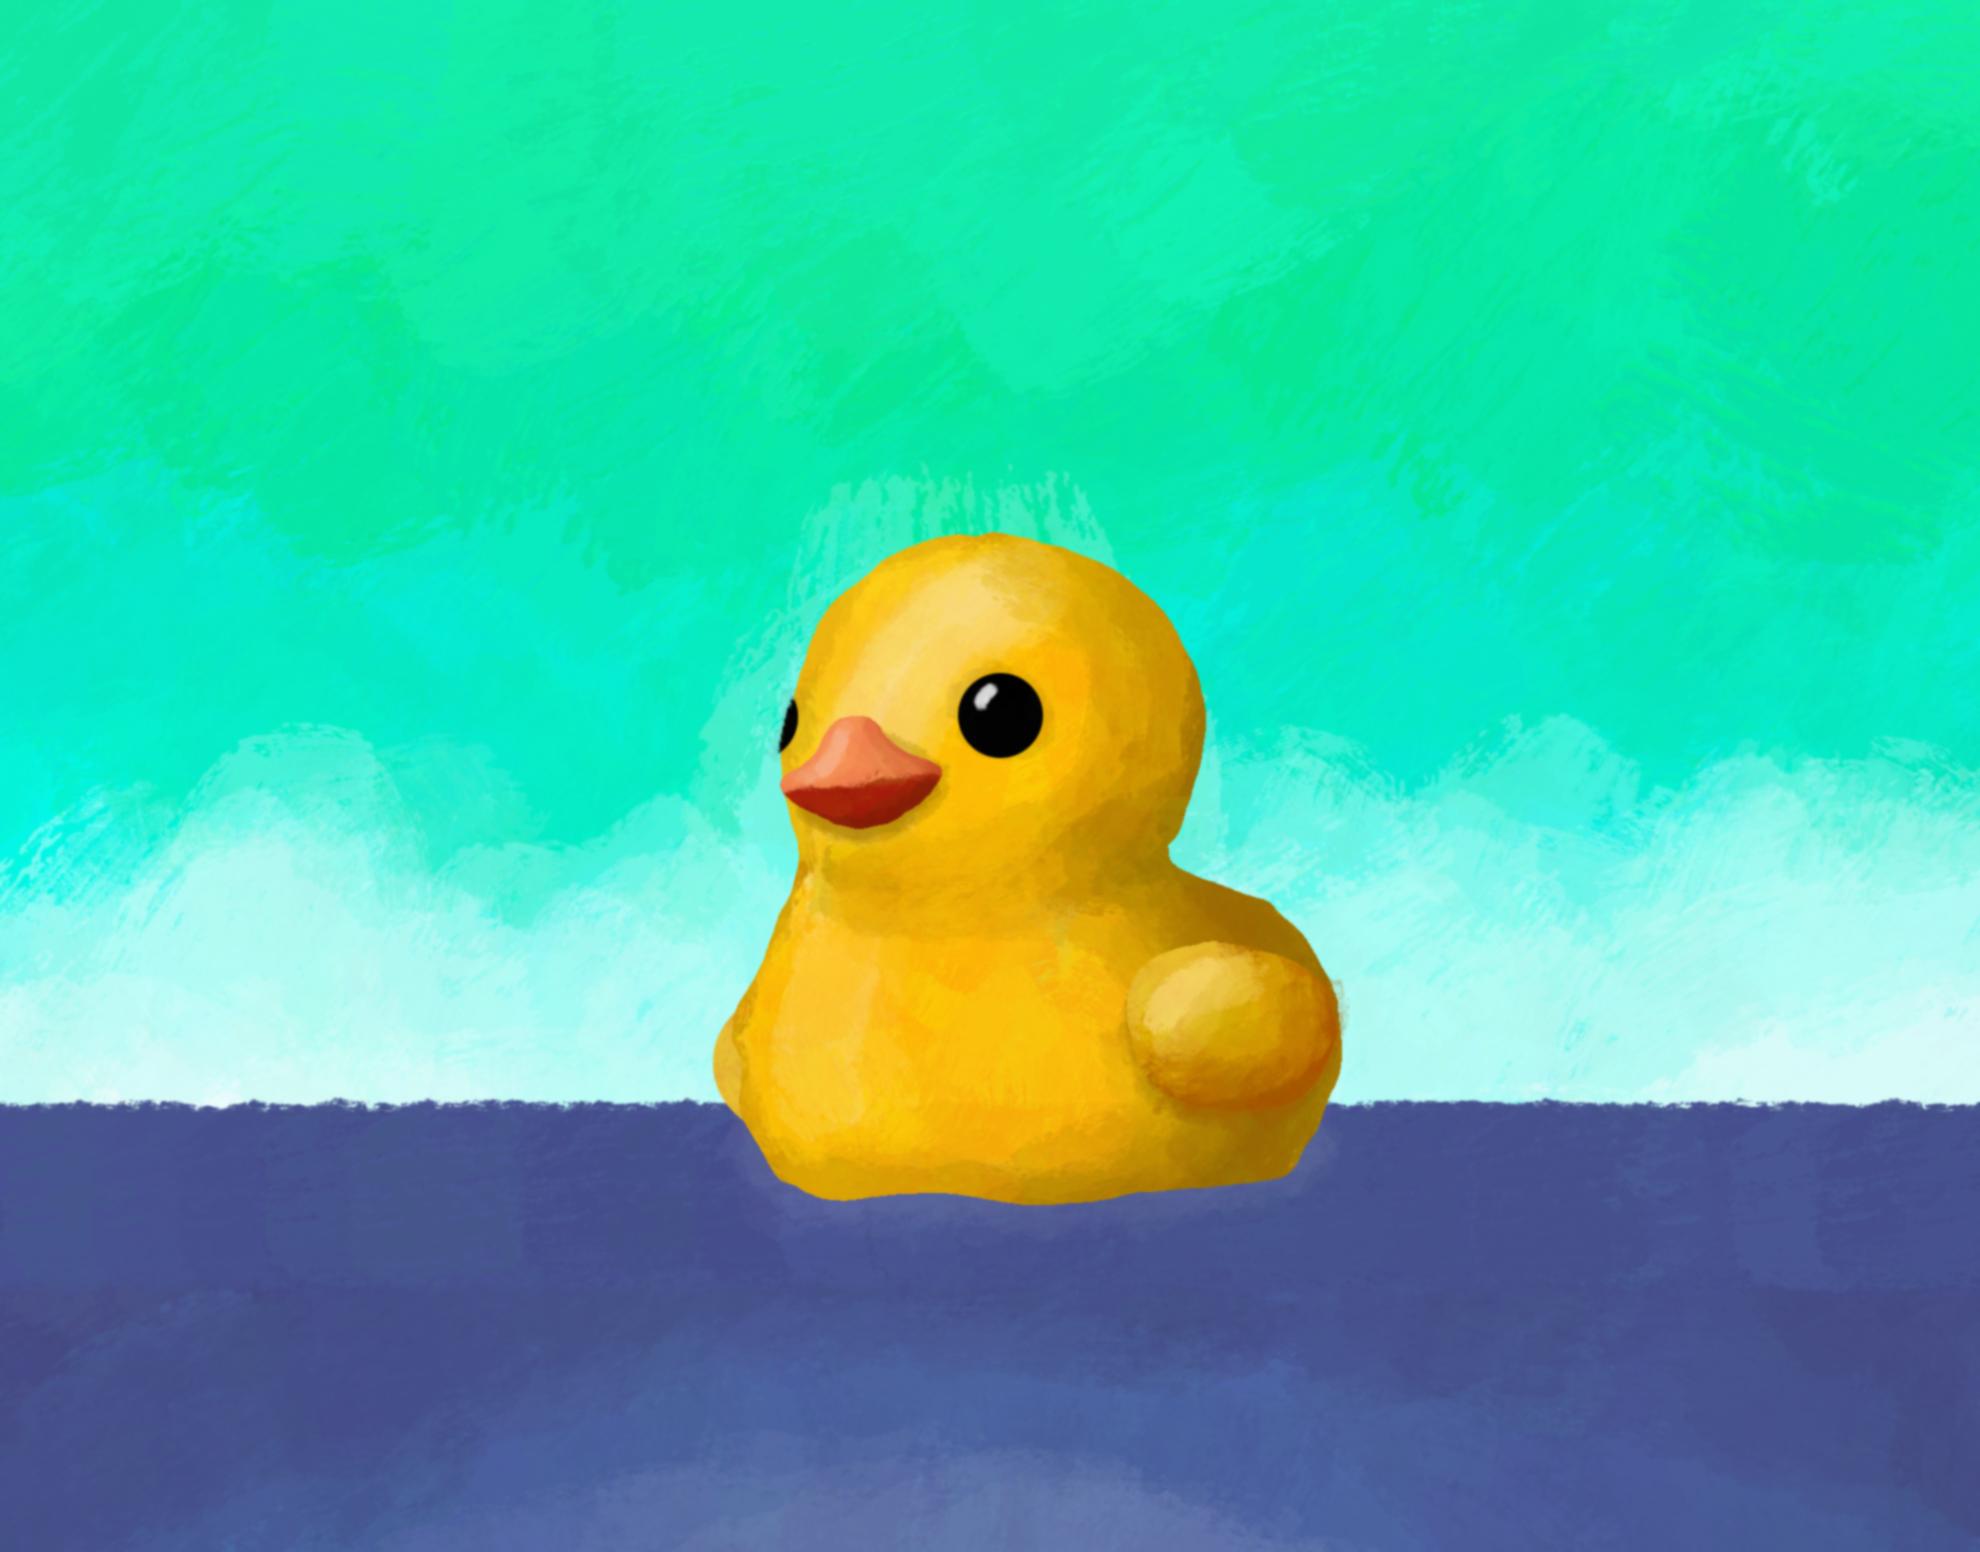 Release the Quacken!